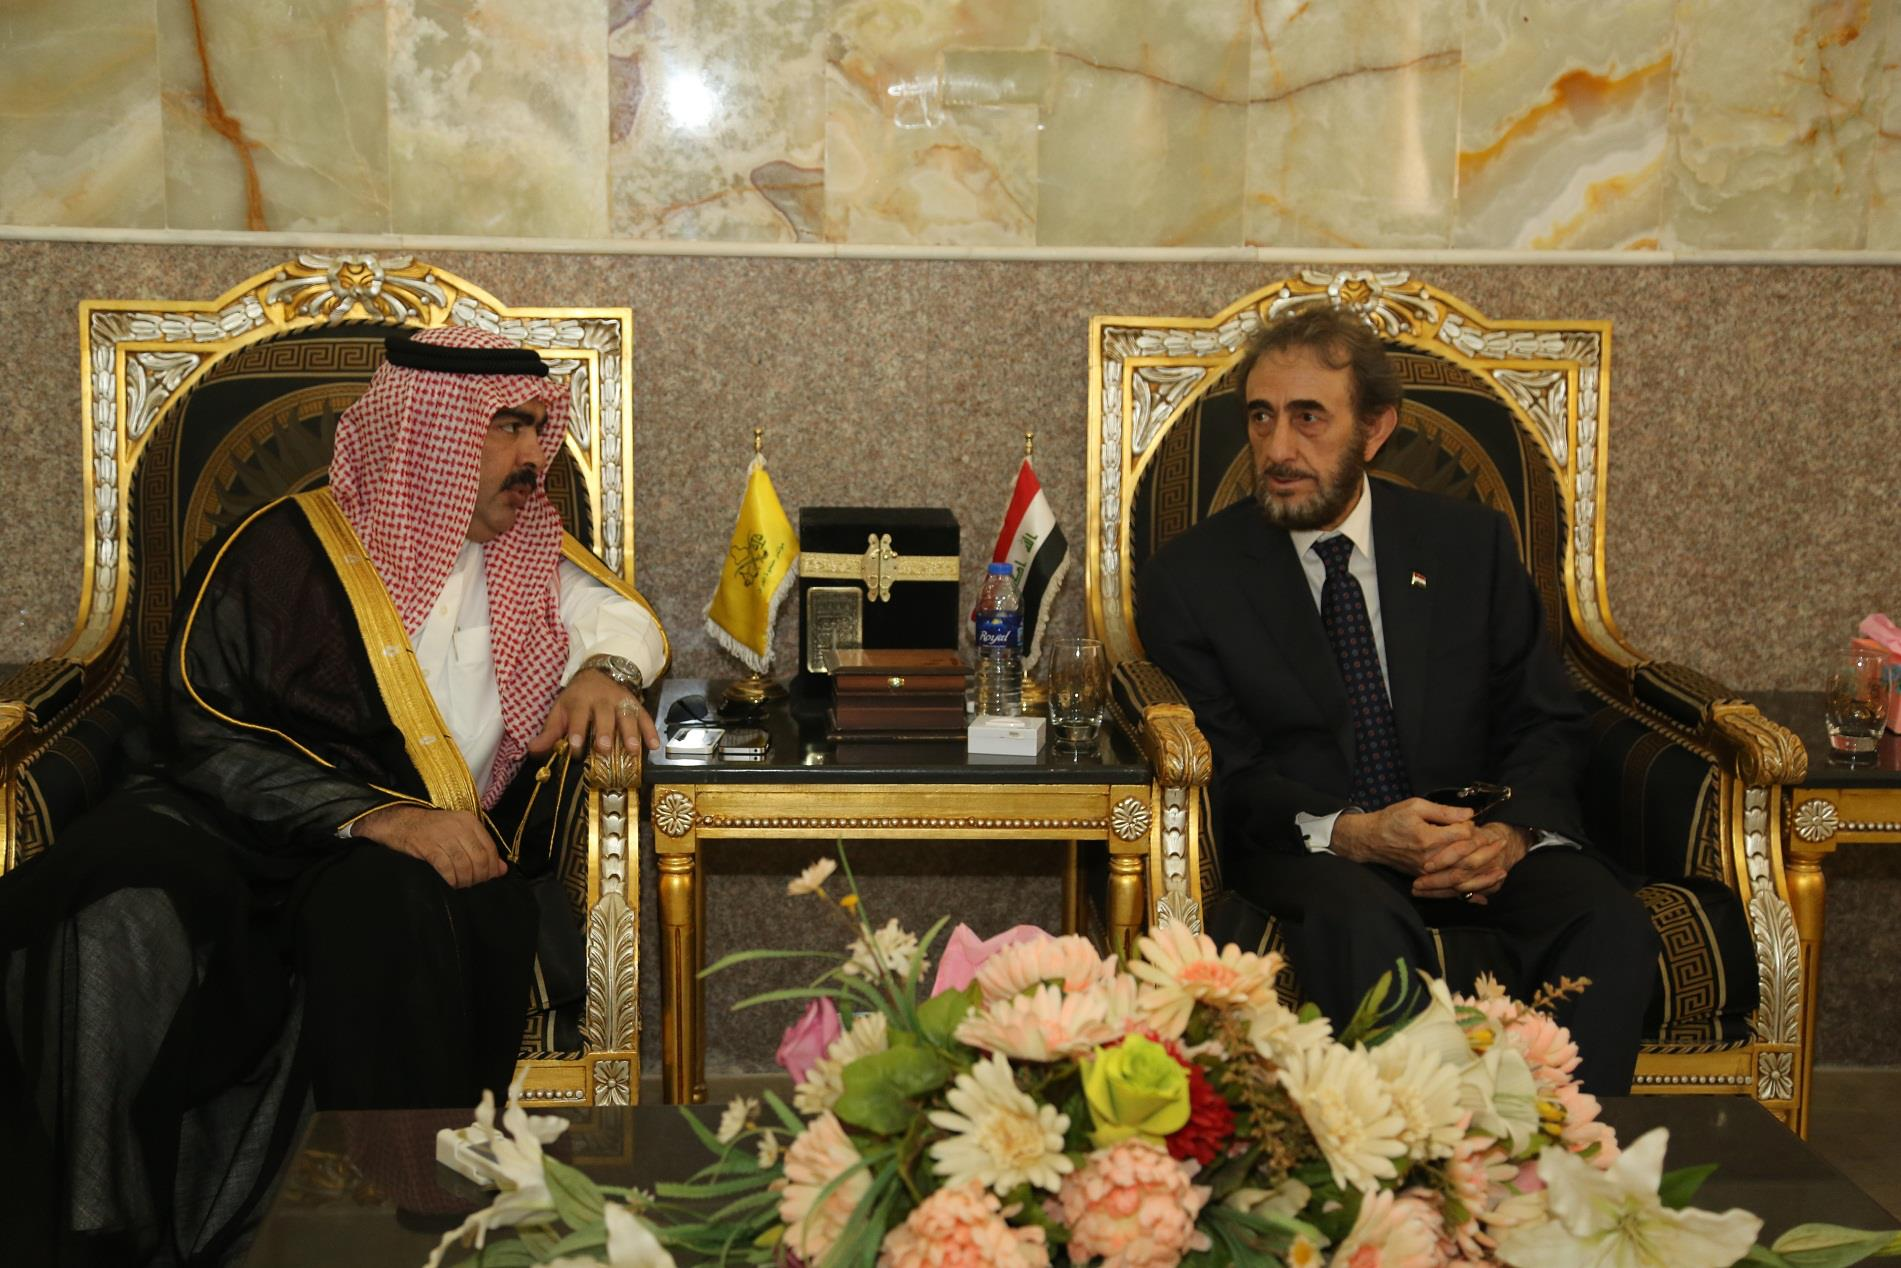 صفقةبـ 6 مليار دينار عرابها احمد ابو ريشة وسعدون ابو ريشة لتوزيعها على شيوخ الانبار